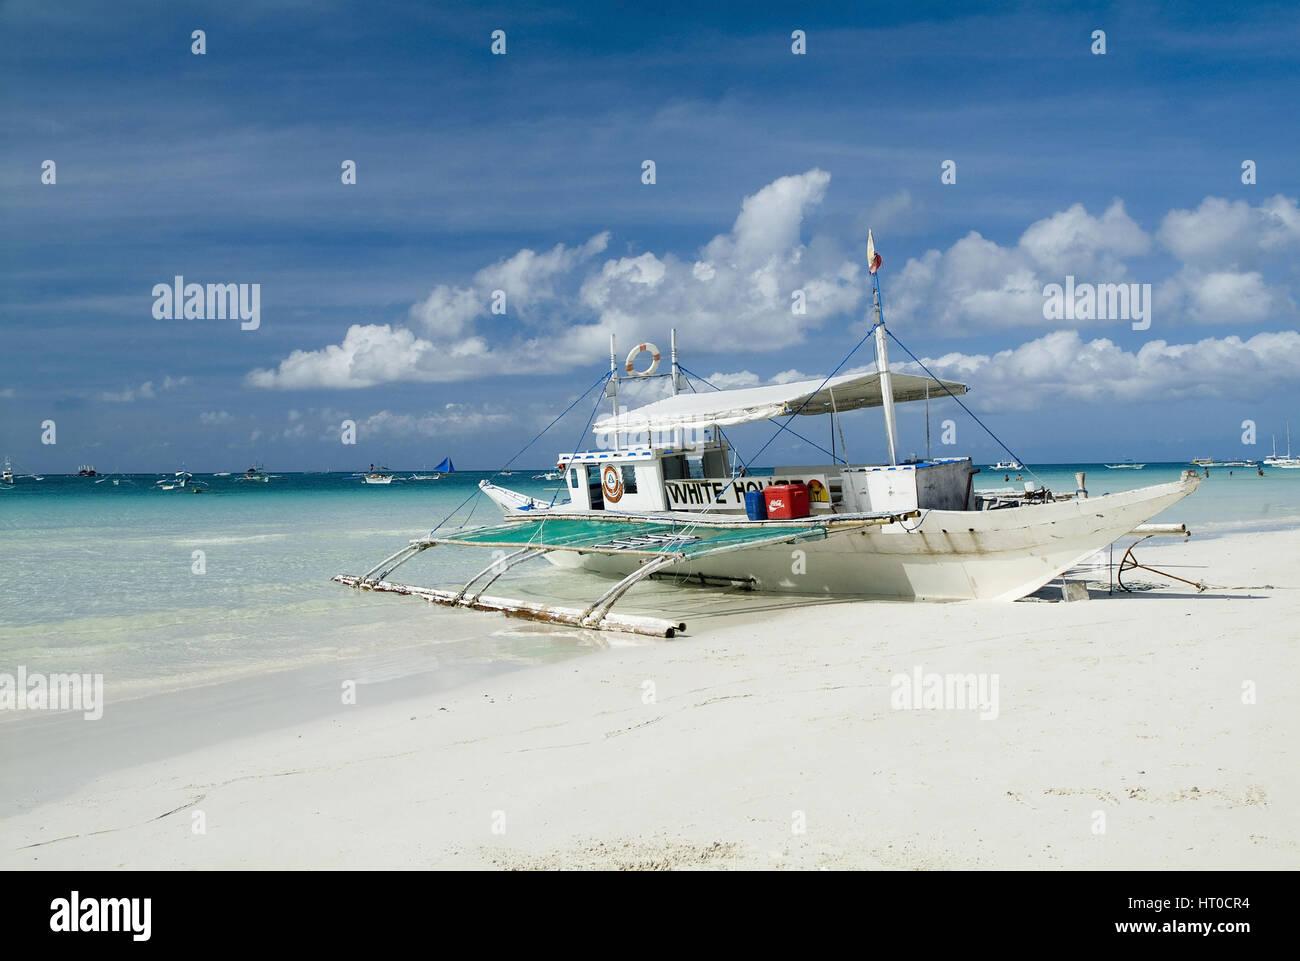 Boot am White Beach, Boracay, Philippinen - boat on White Beach, Boracay, Philippines - Stock Image